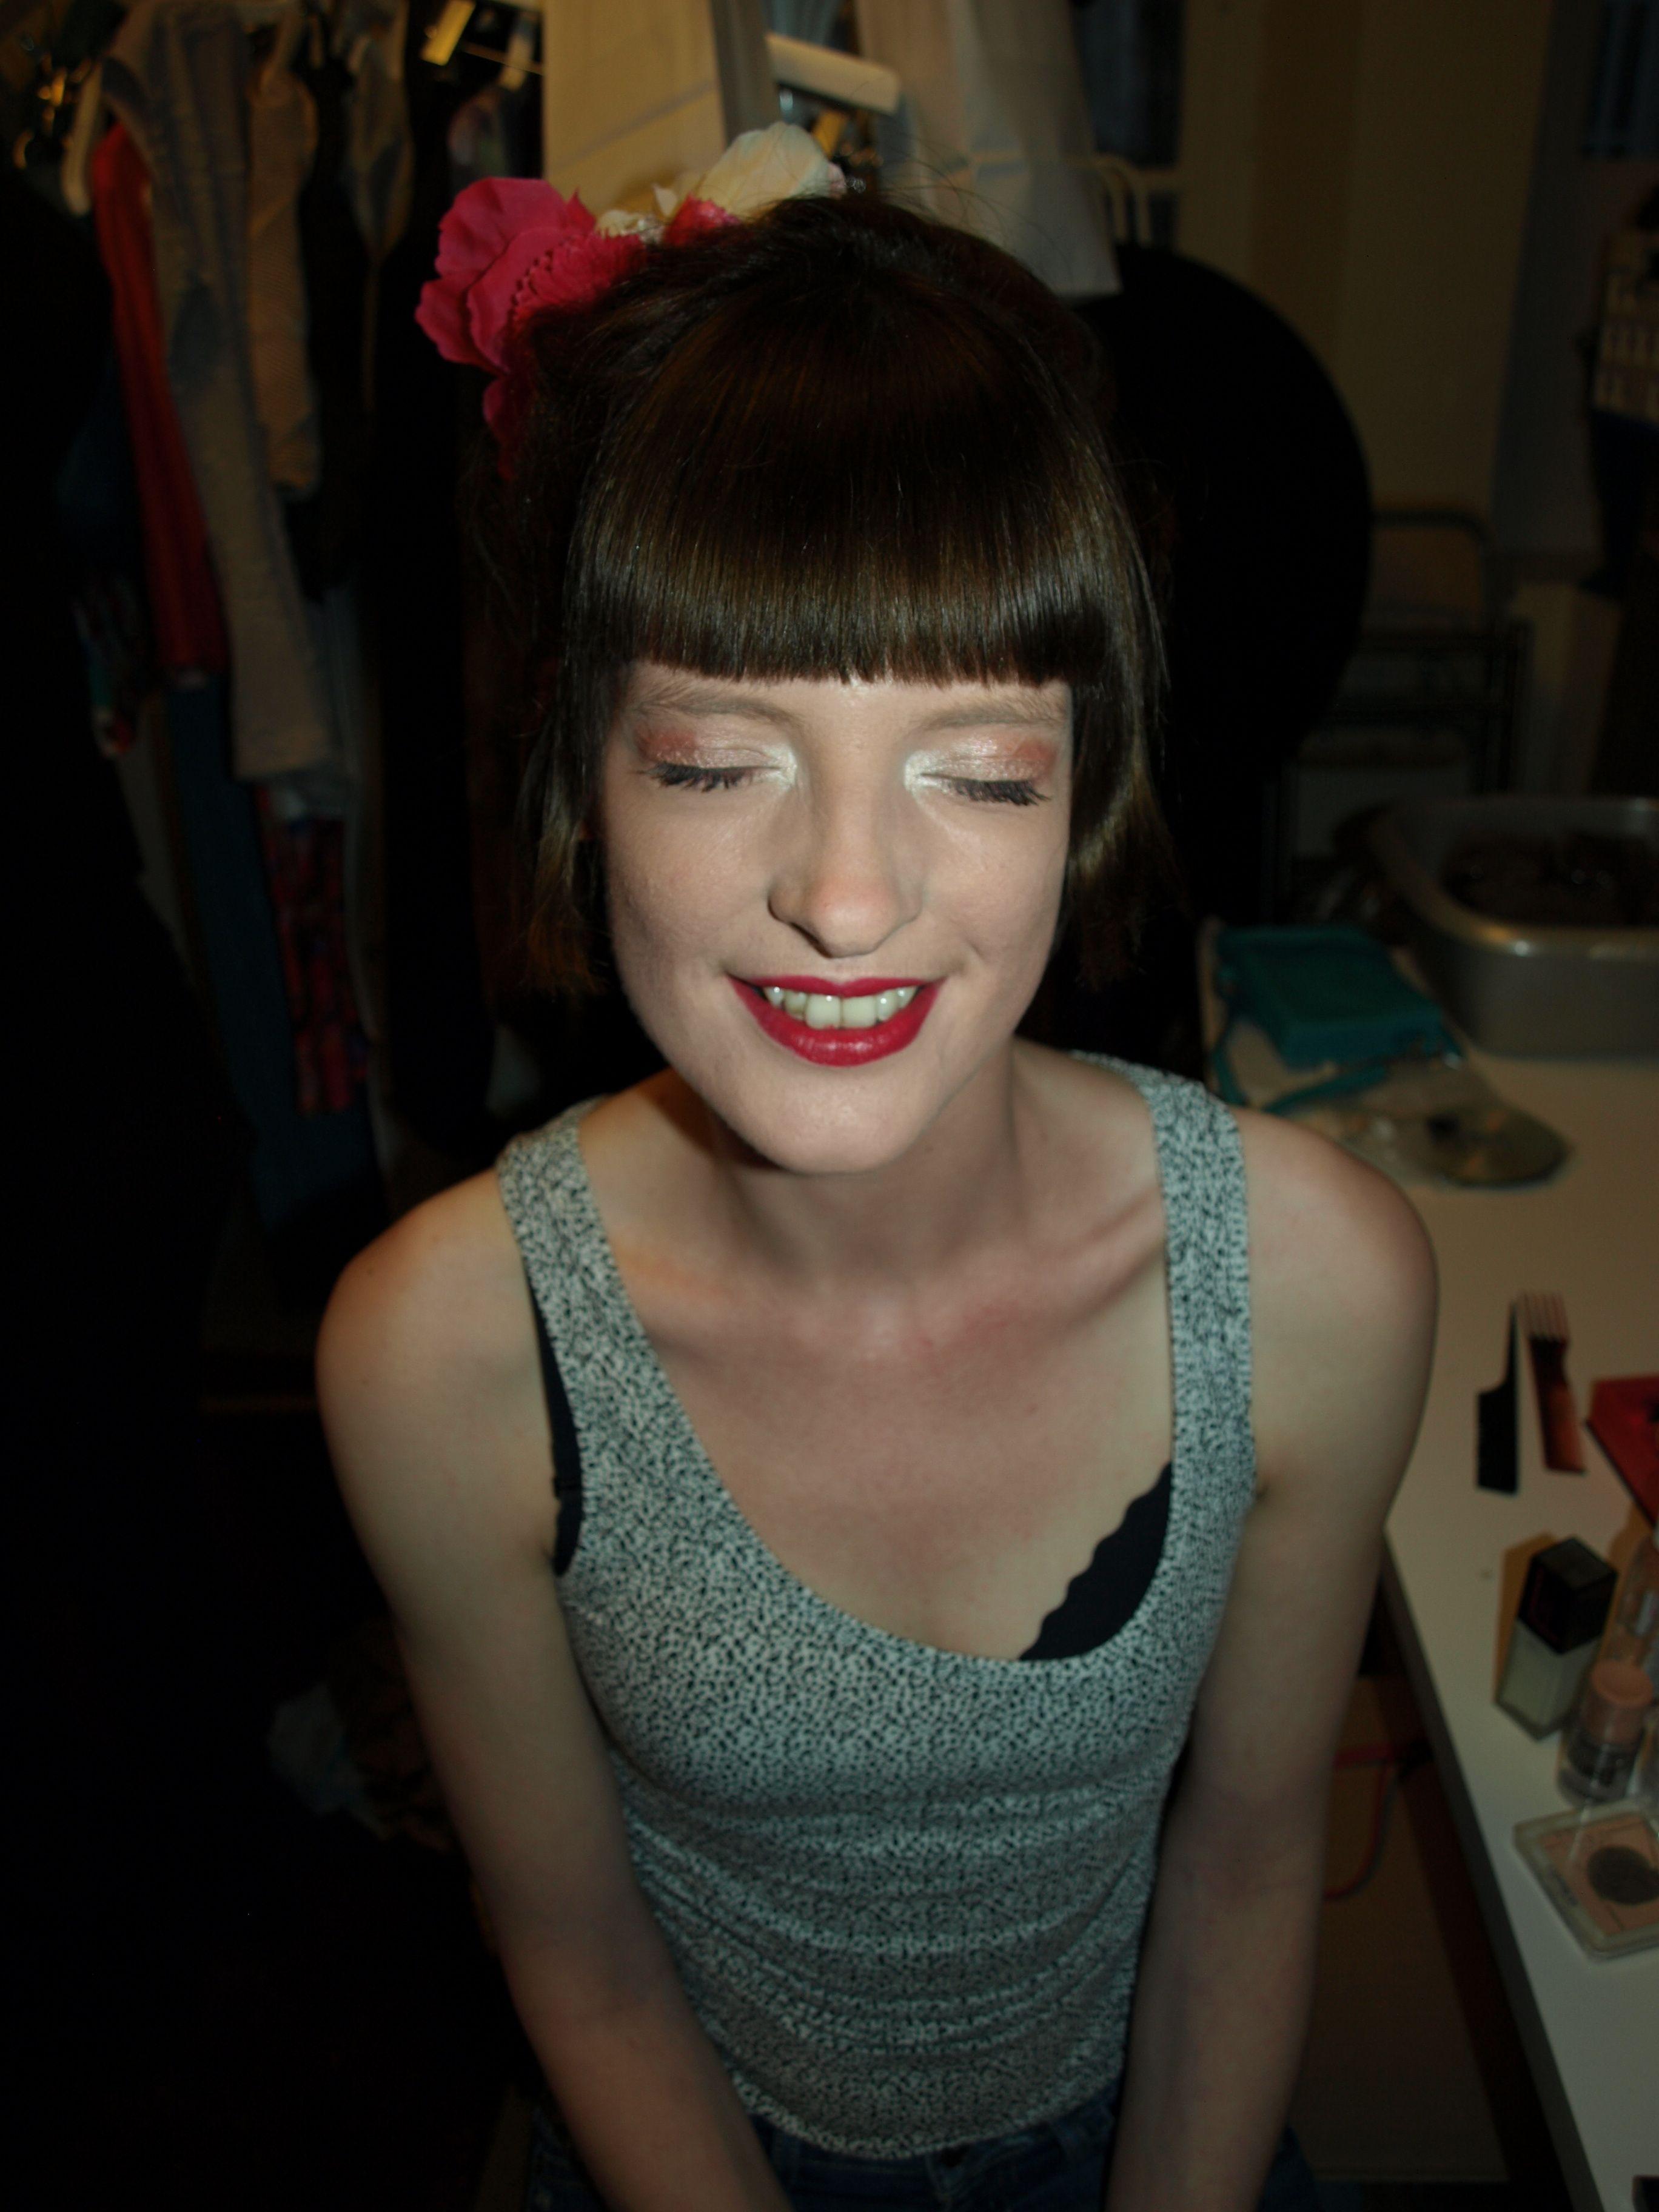 Styliste: Marie Schweisthal Modèles: Alexandra Dimauro, Lydwine Habay et Julie Woitrin Make-up/Hair/Photo: Celine Paul  Boutique: Cap sur l'Essentiel